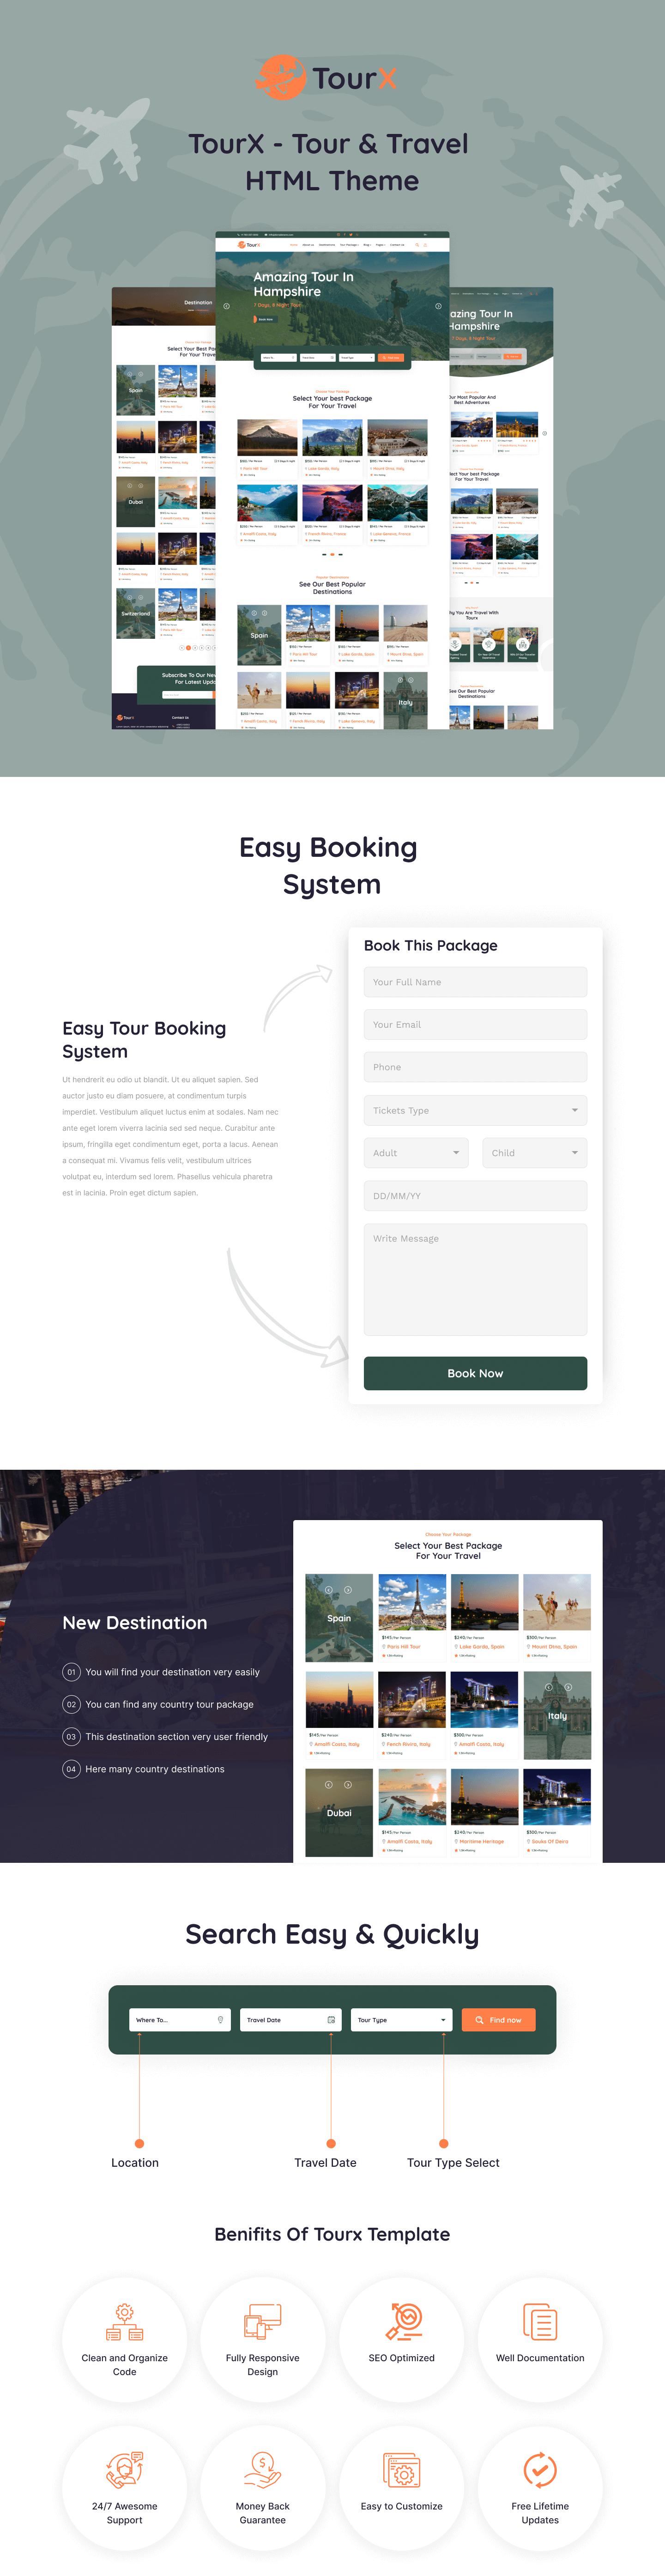 Travels Tourism HTML Templates